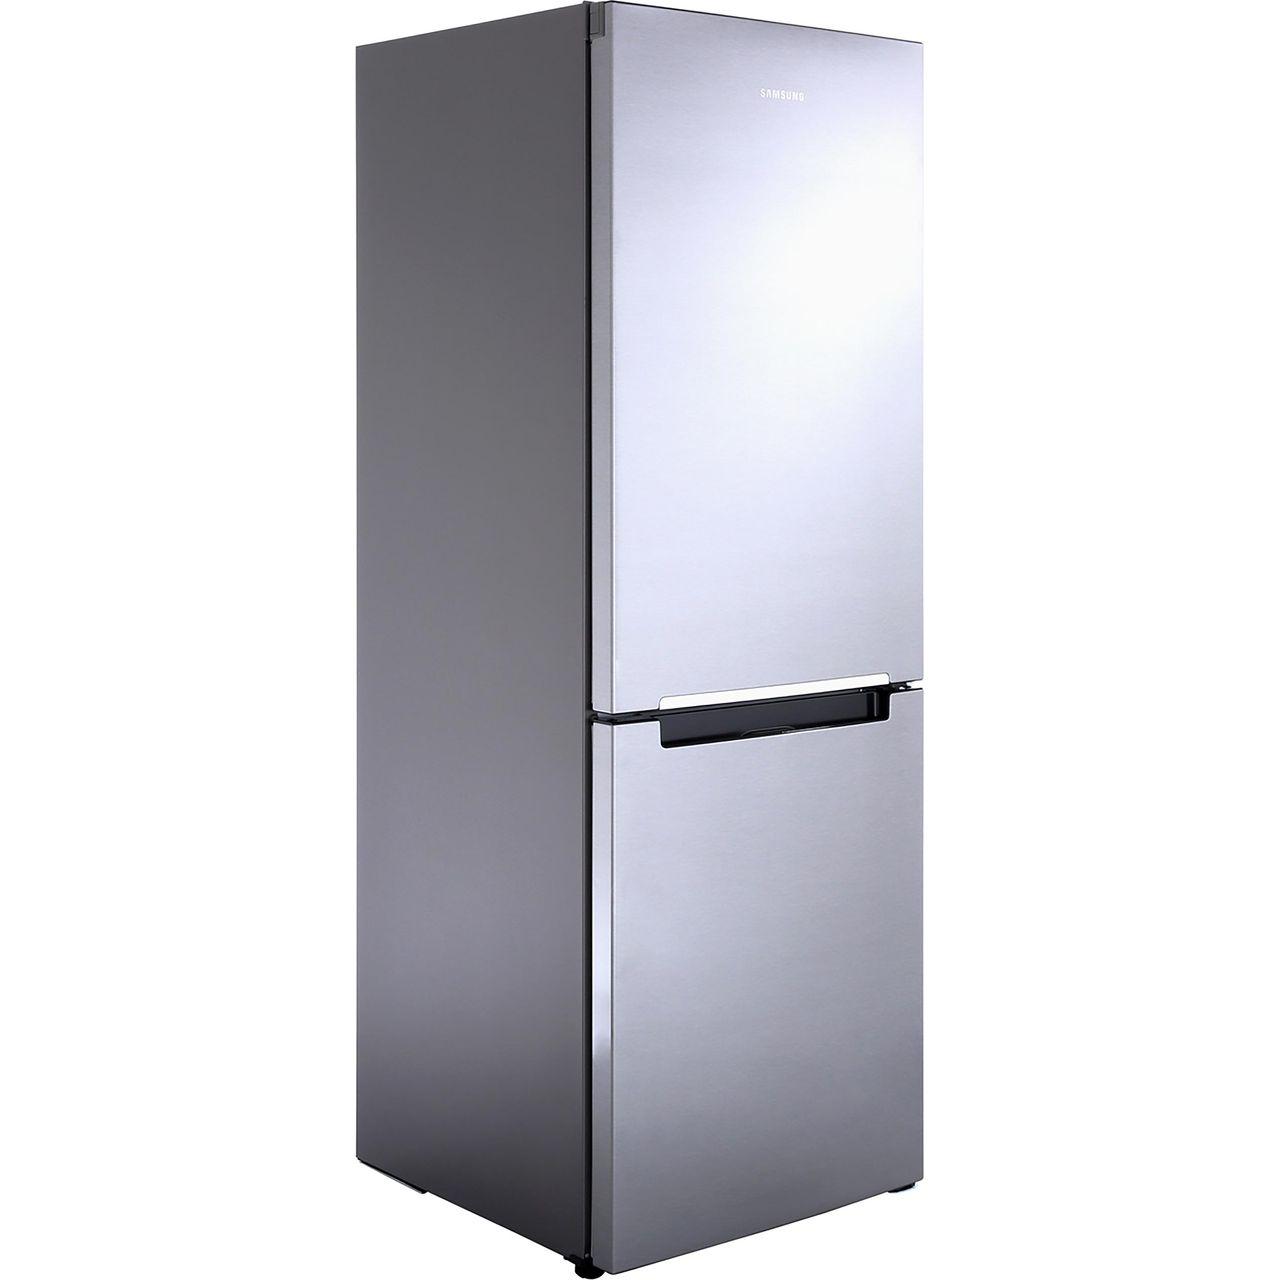 Samsung RB Combi Range RB29FSRNDSA Free Standing Fridge Freezer Frost Free in Silver